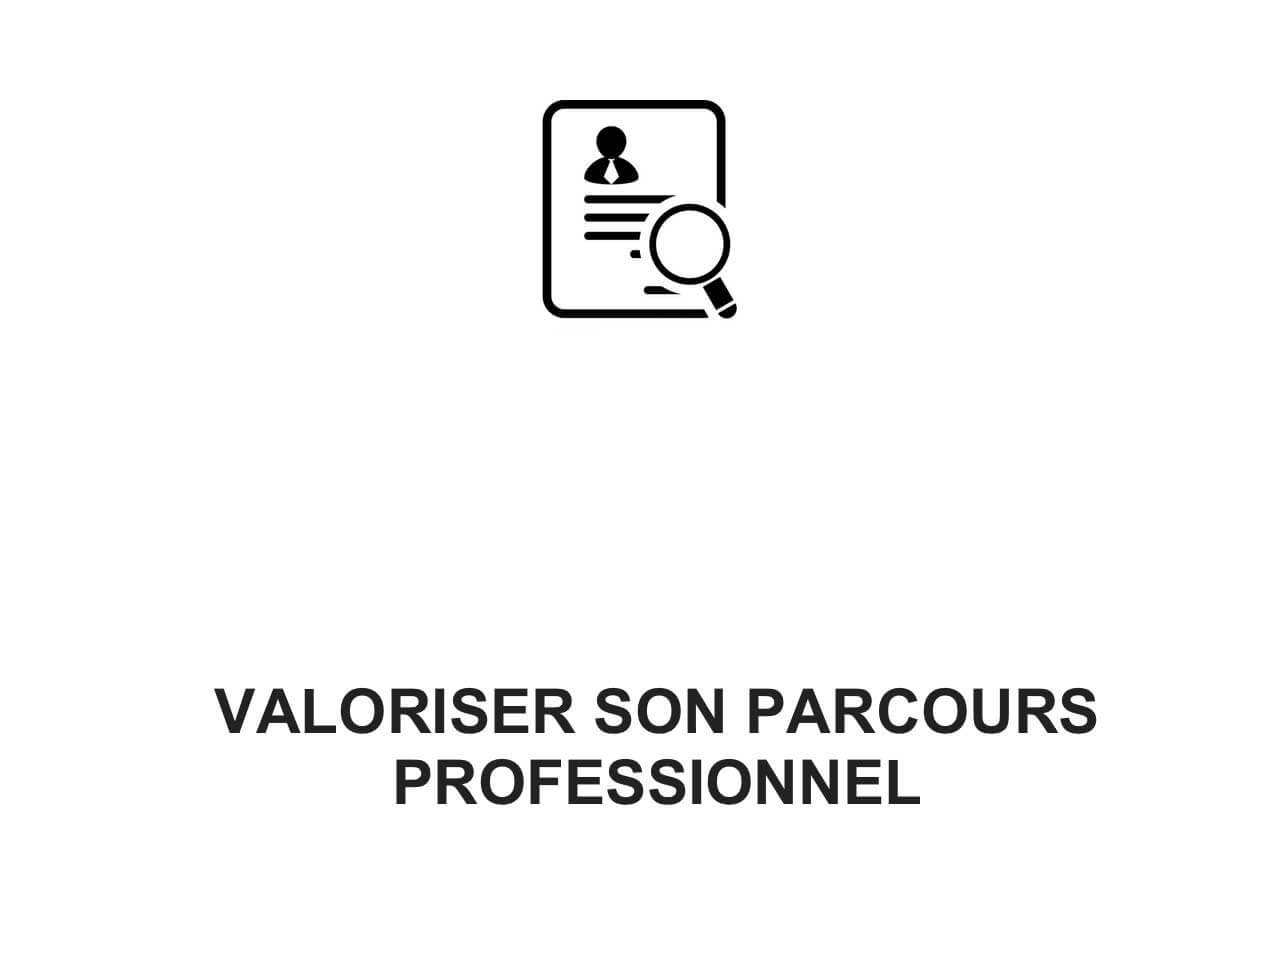 jobtimise-valoriser-son-parcours-professionel